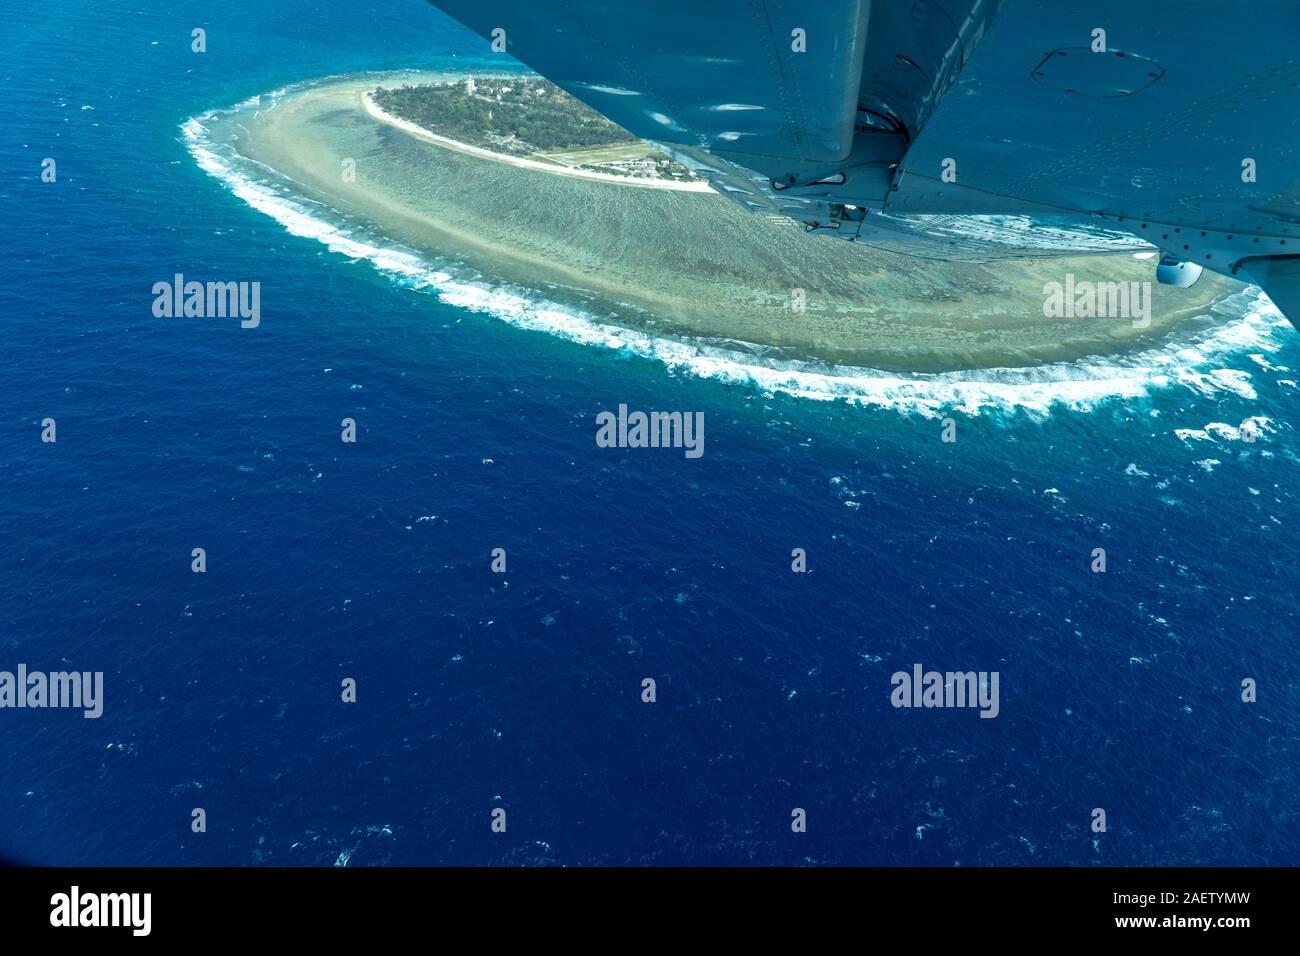 Aerial view of Lady Elliot Island in Queensland, Australia. Stock Photo